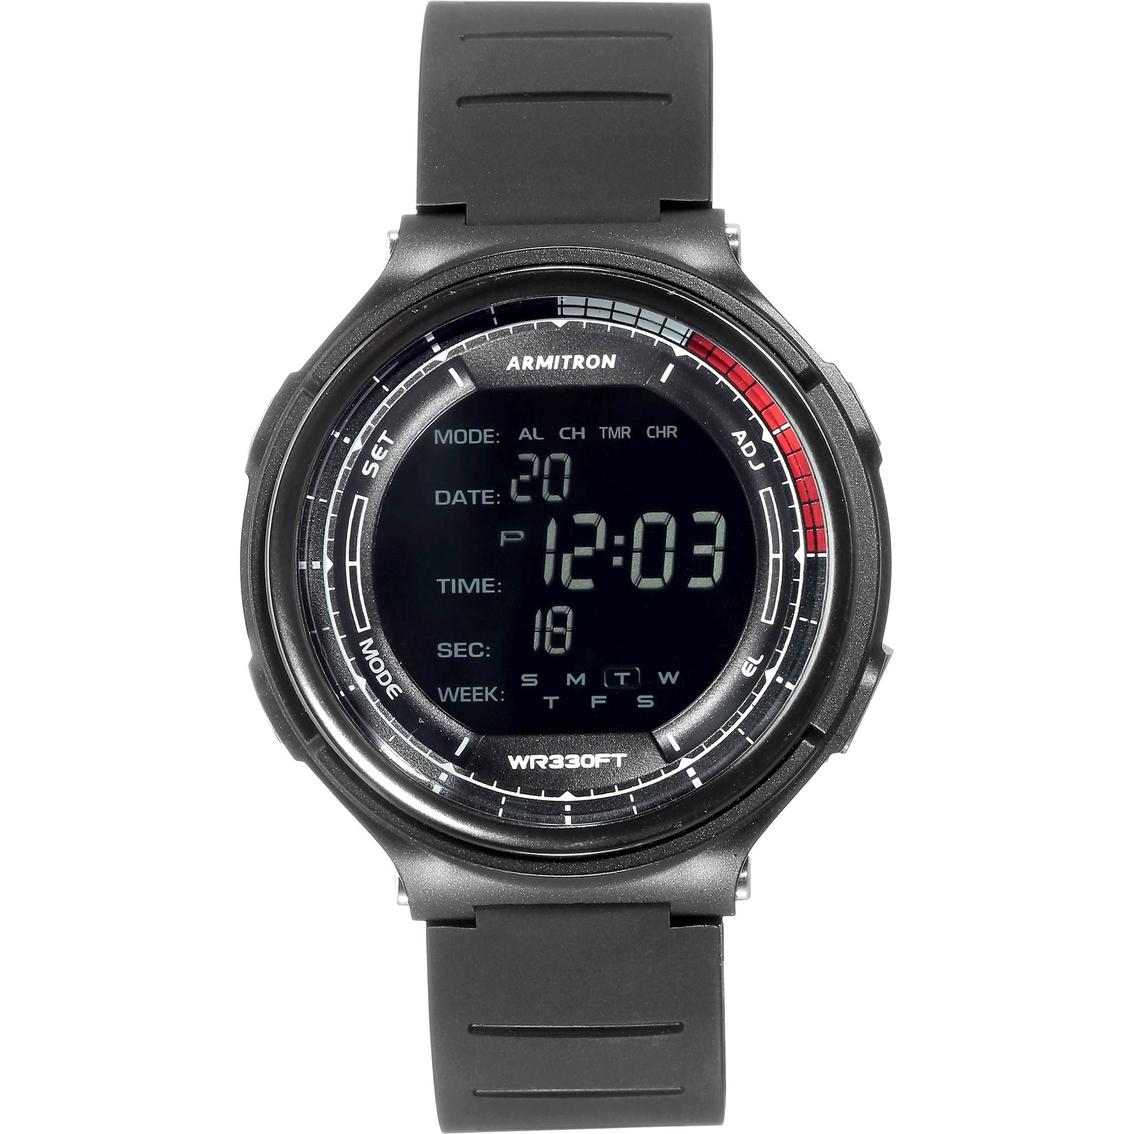 eb458d87c Armitron Sport Men's Digital Chronograph Resin Strap Watch 40/8418 ...